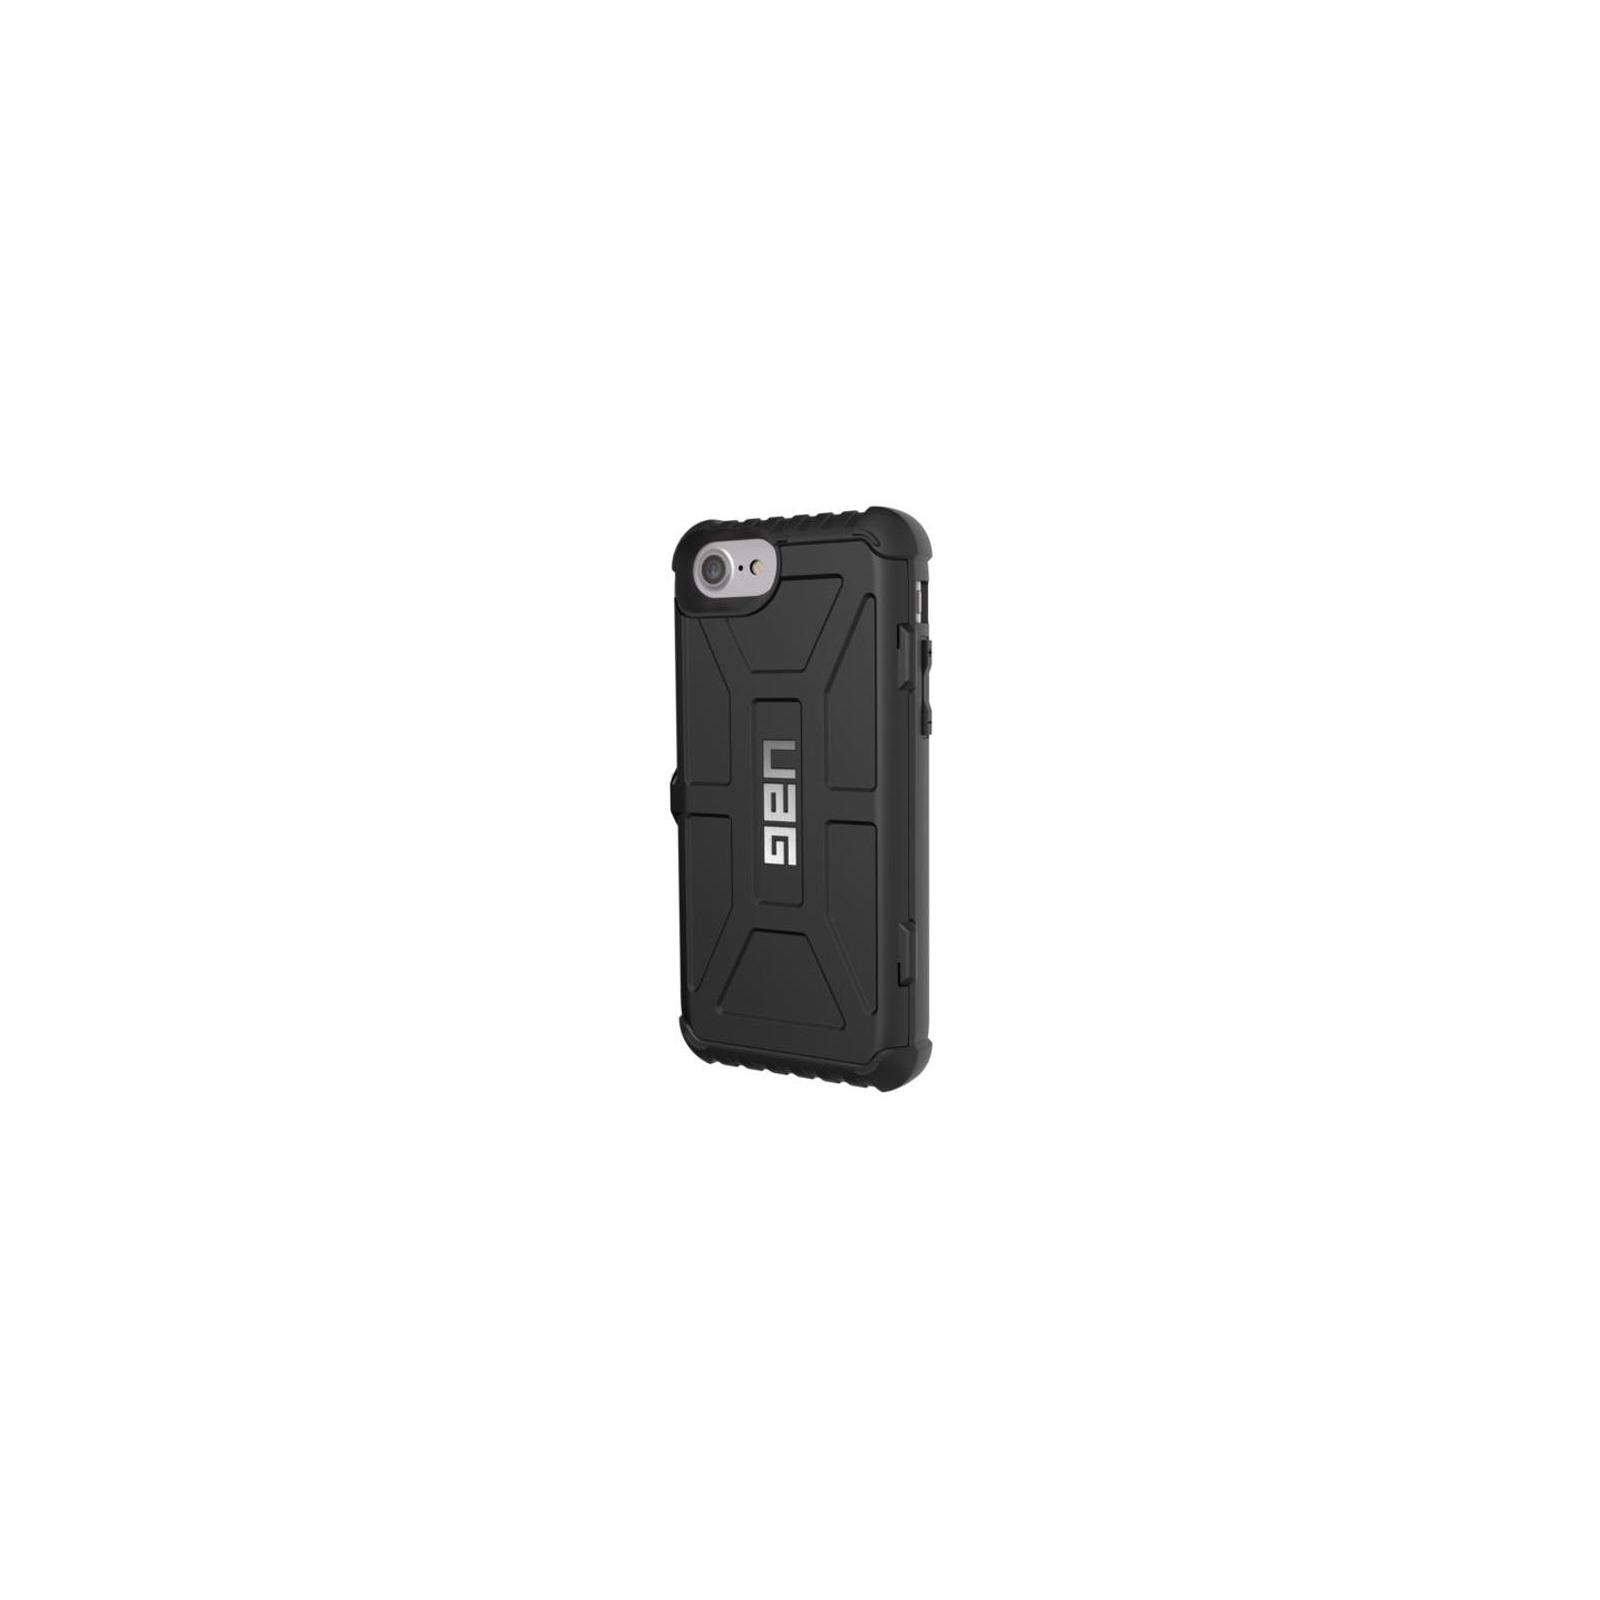 Чехол для моб. телефона Uag iPhone 8/7/6S/6 Trooper Case Black (IPH7/6S-T-BK) изображение 2